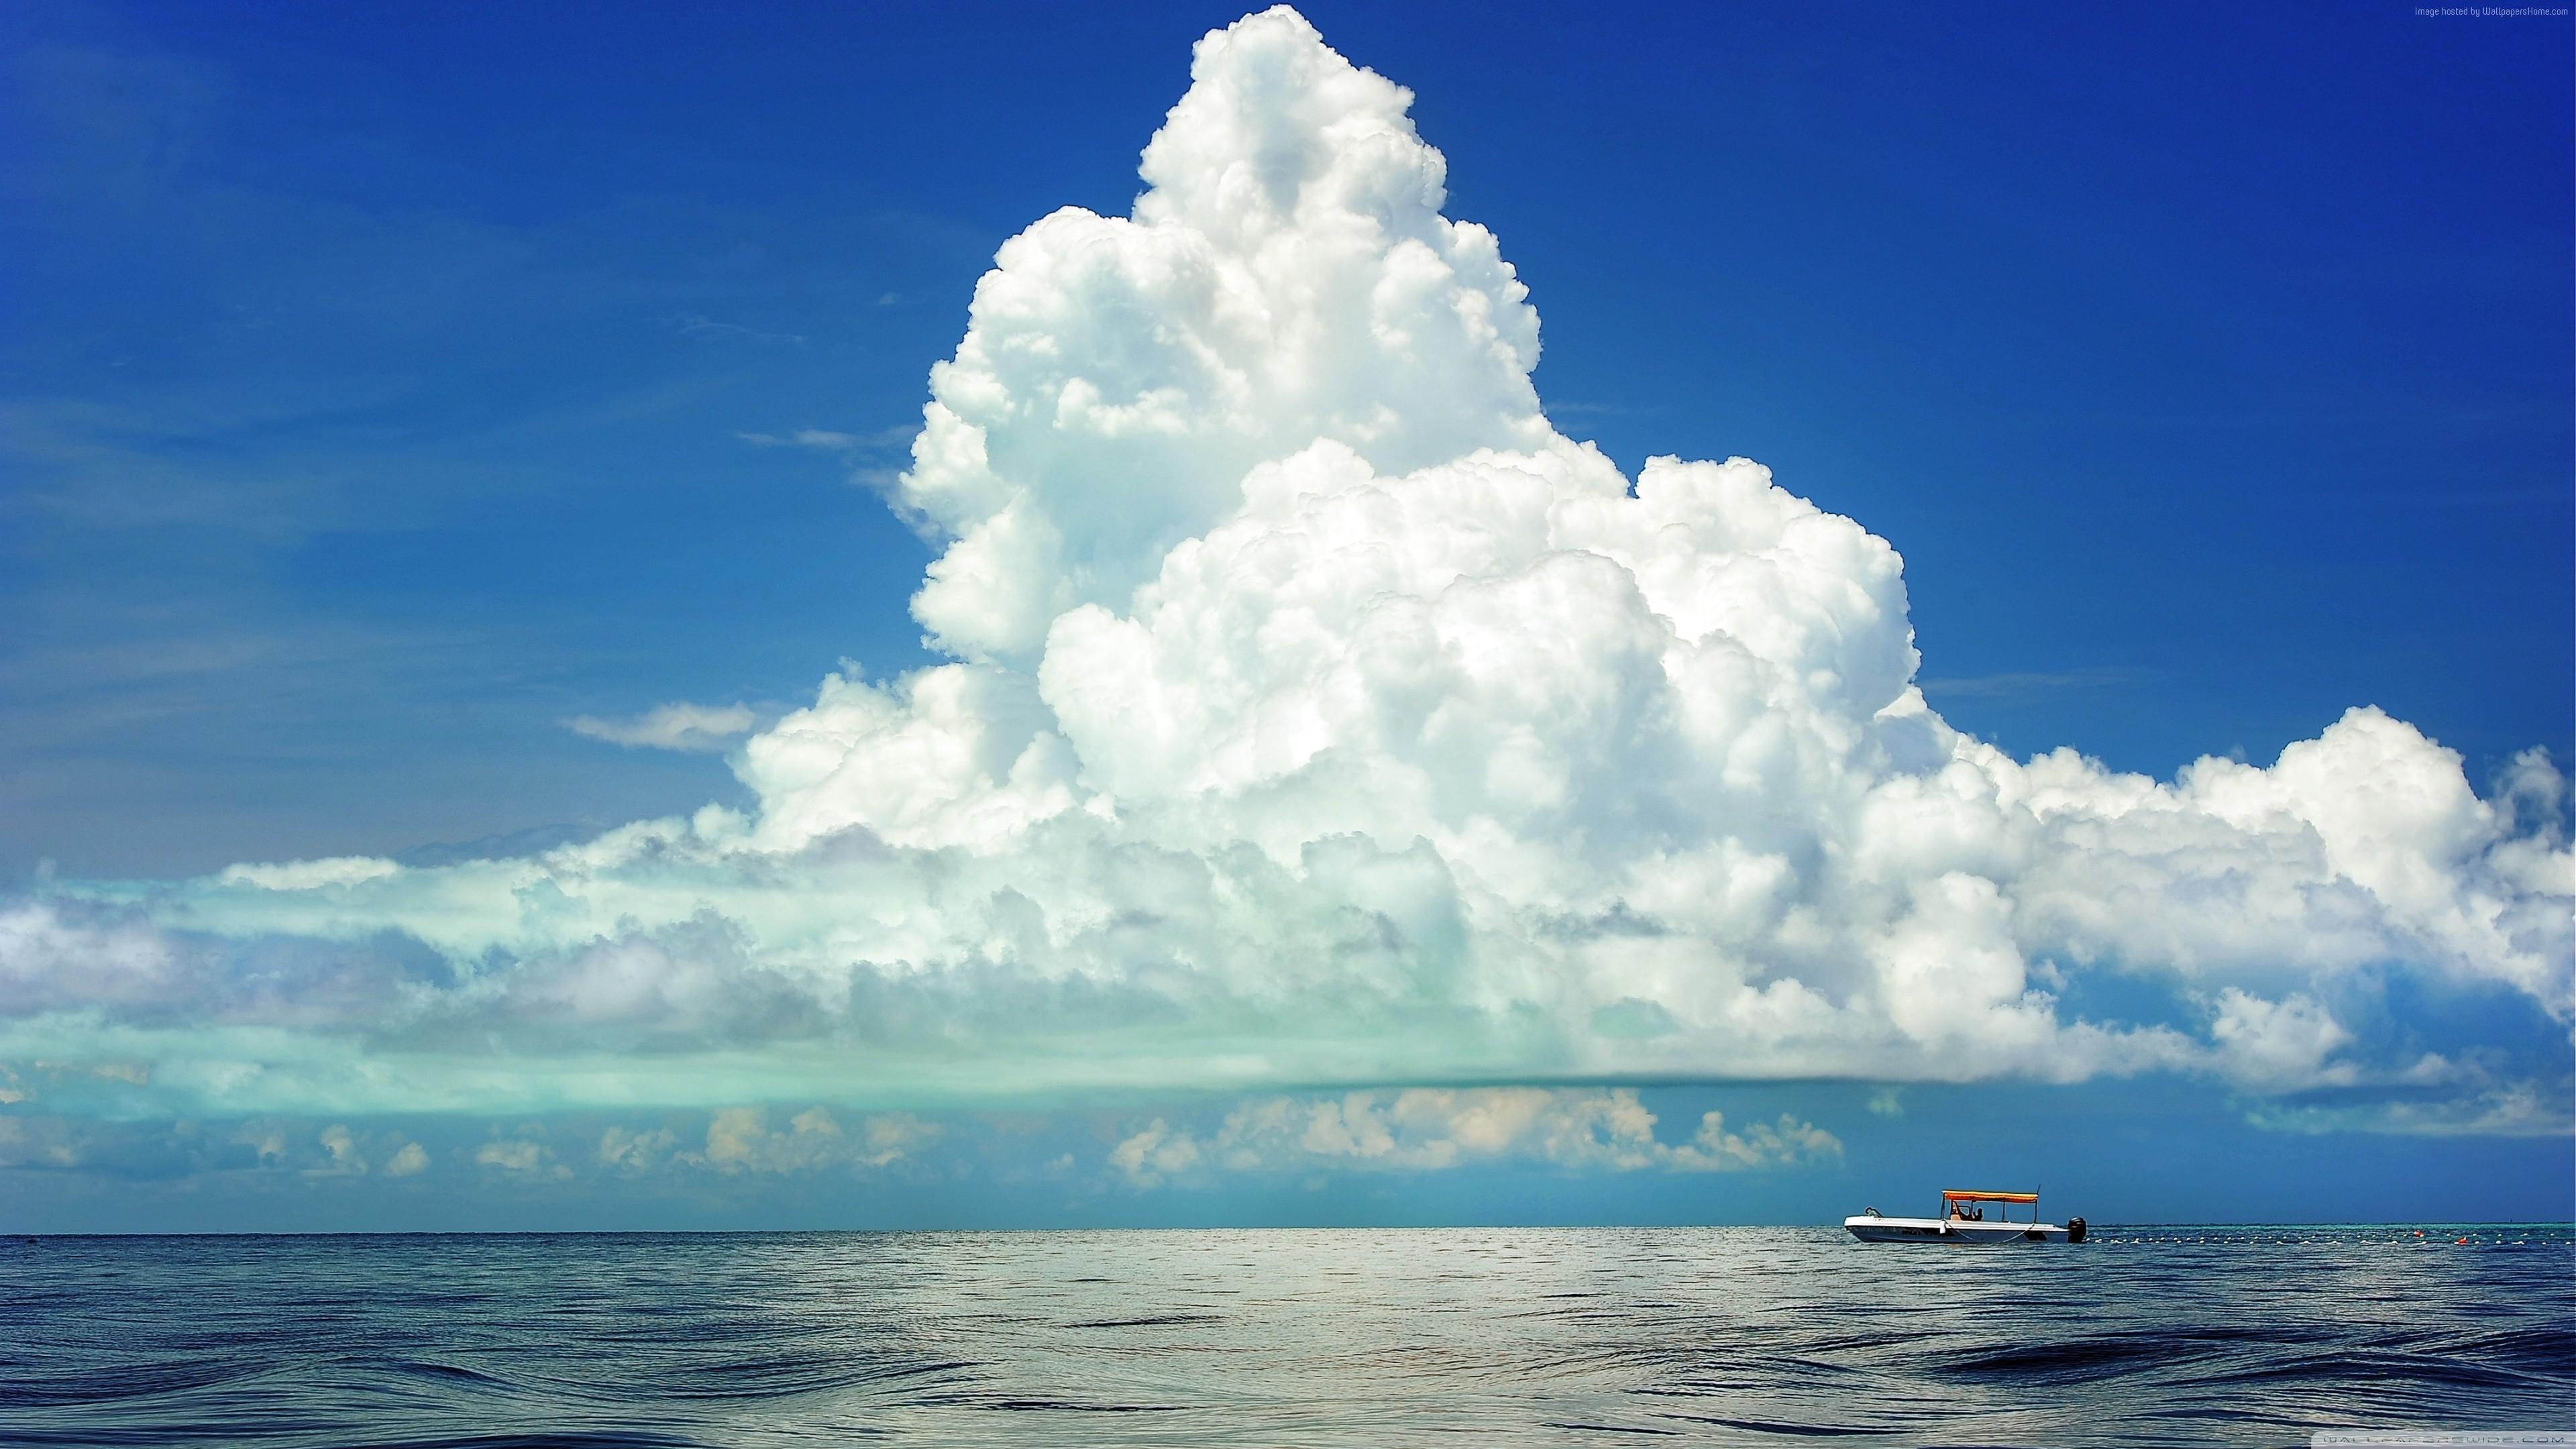 Res: 3840x2160, cumulus clouds, 4k, HD wallpaper, sky, sea (horizontal) ...